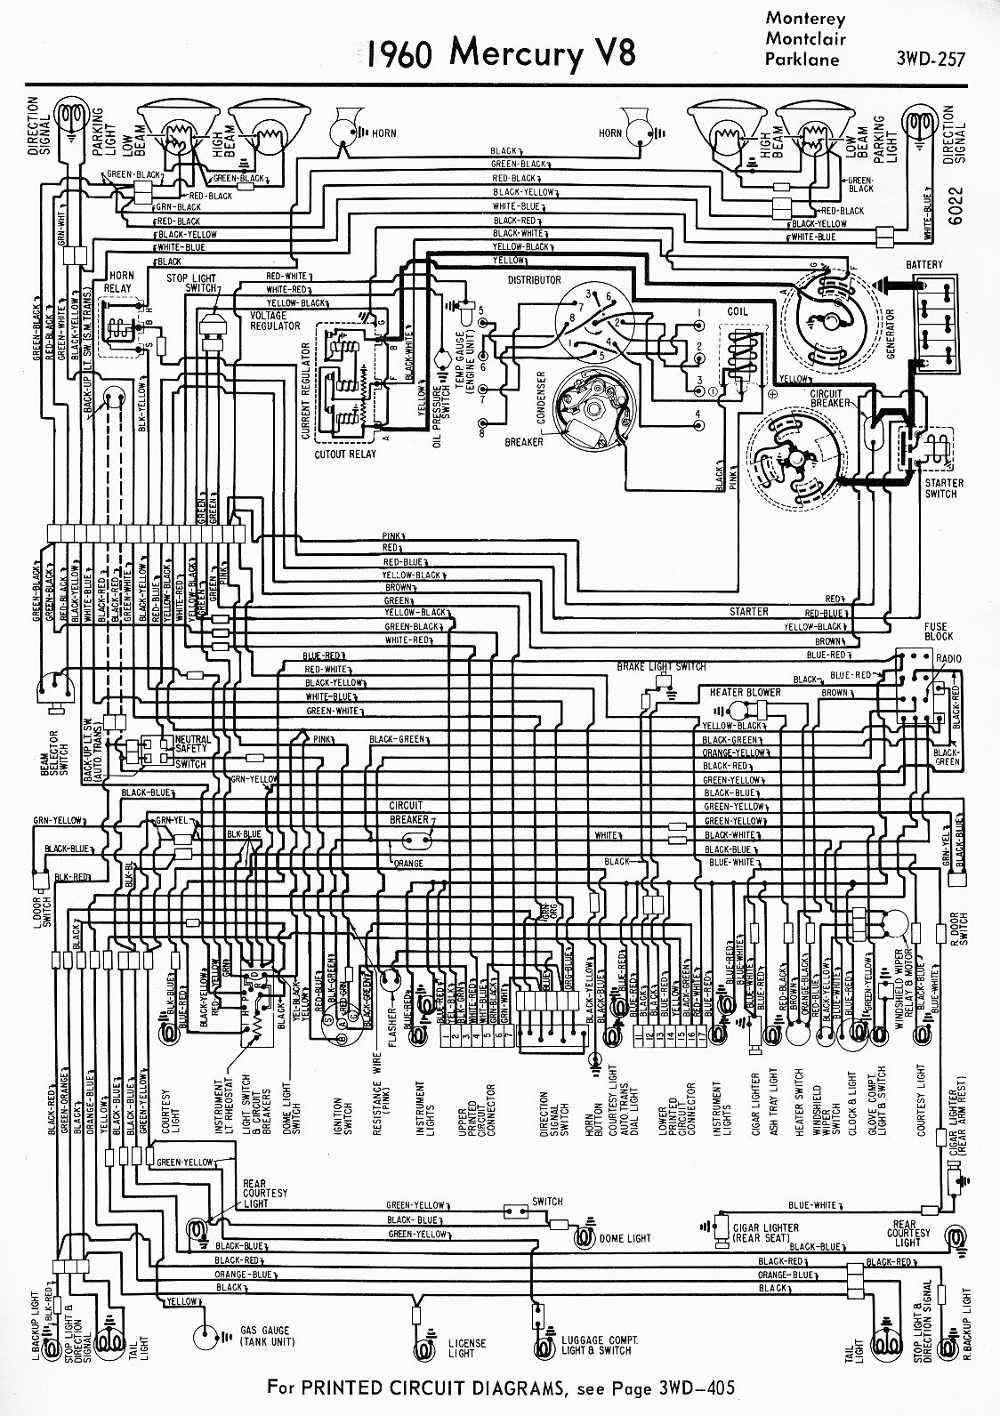 bluebird wiring diagrams light free download wiring diagram s13 wire  diagram 2002 bluebird bus wiring diagram